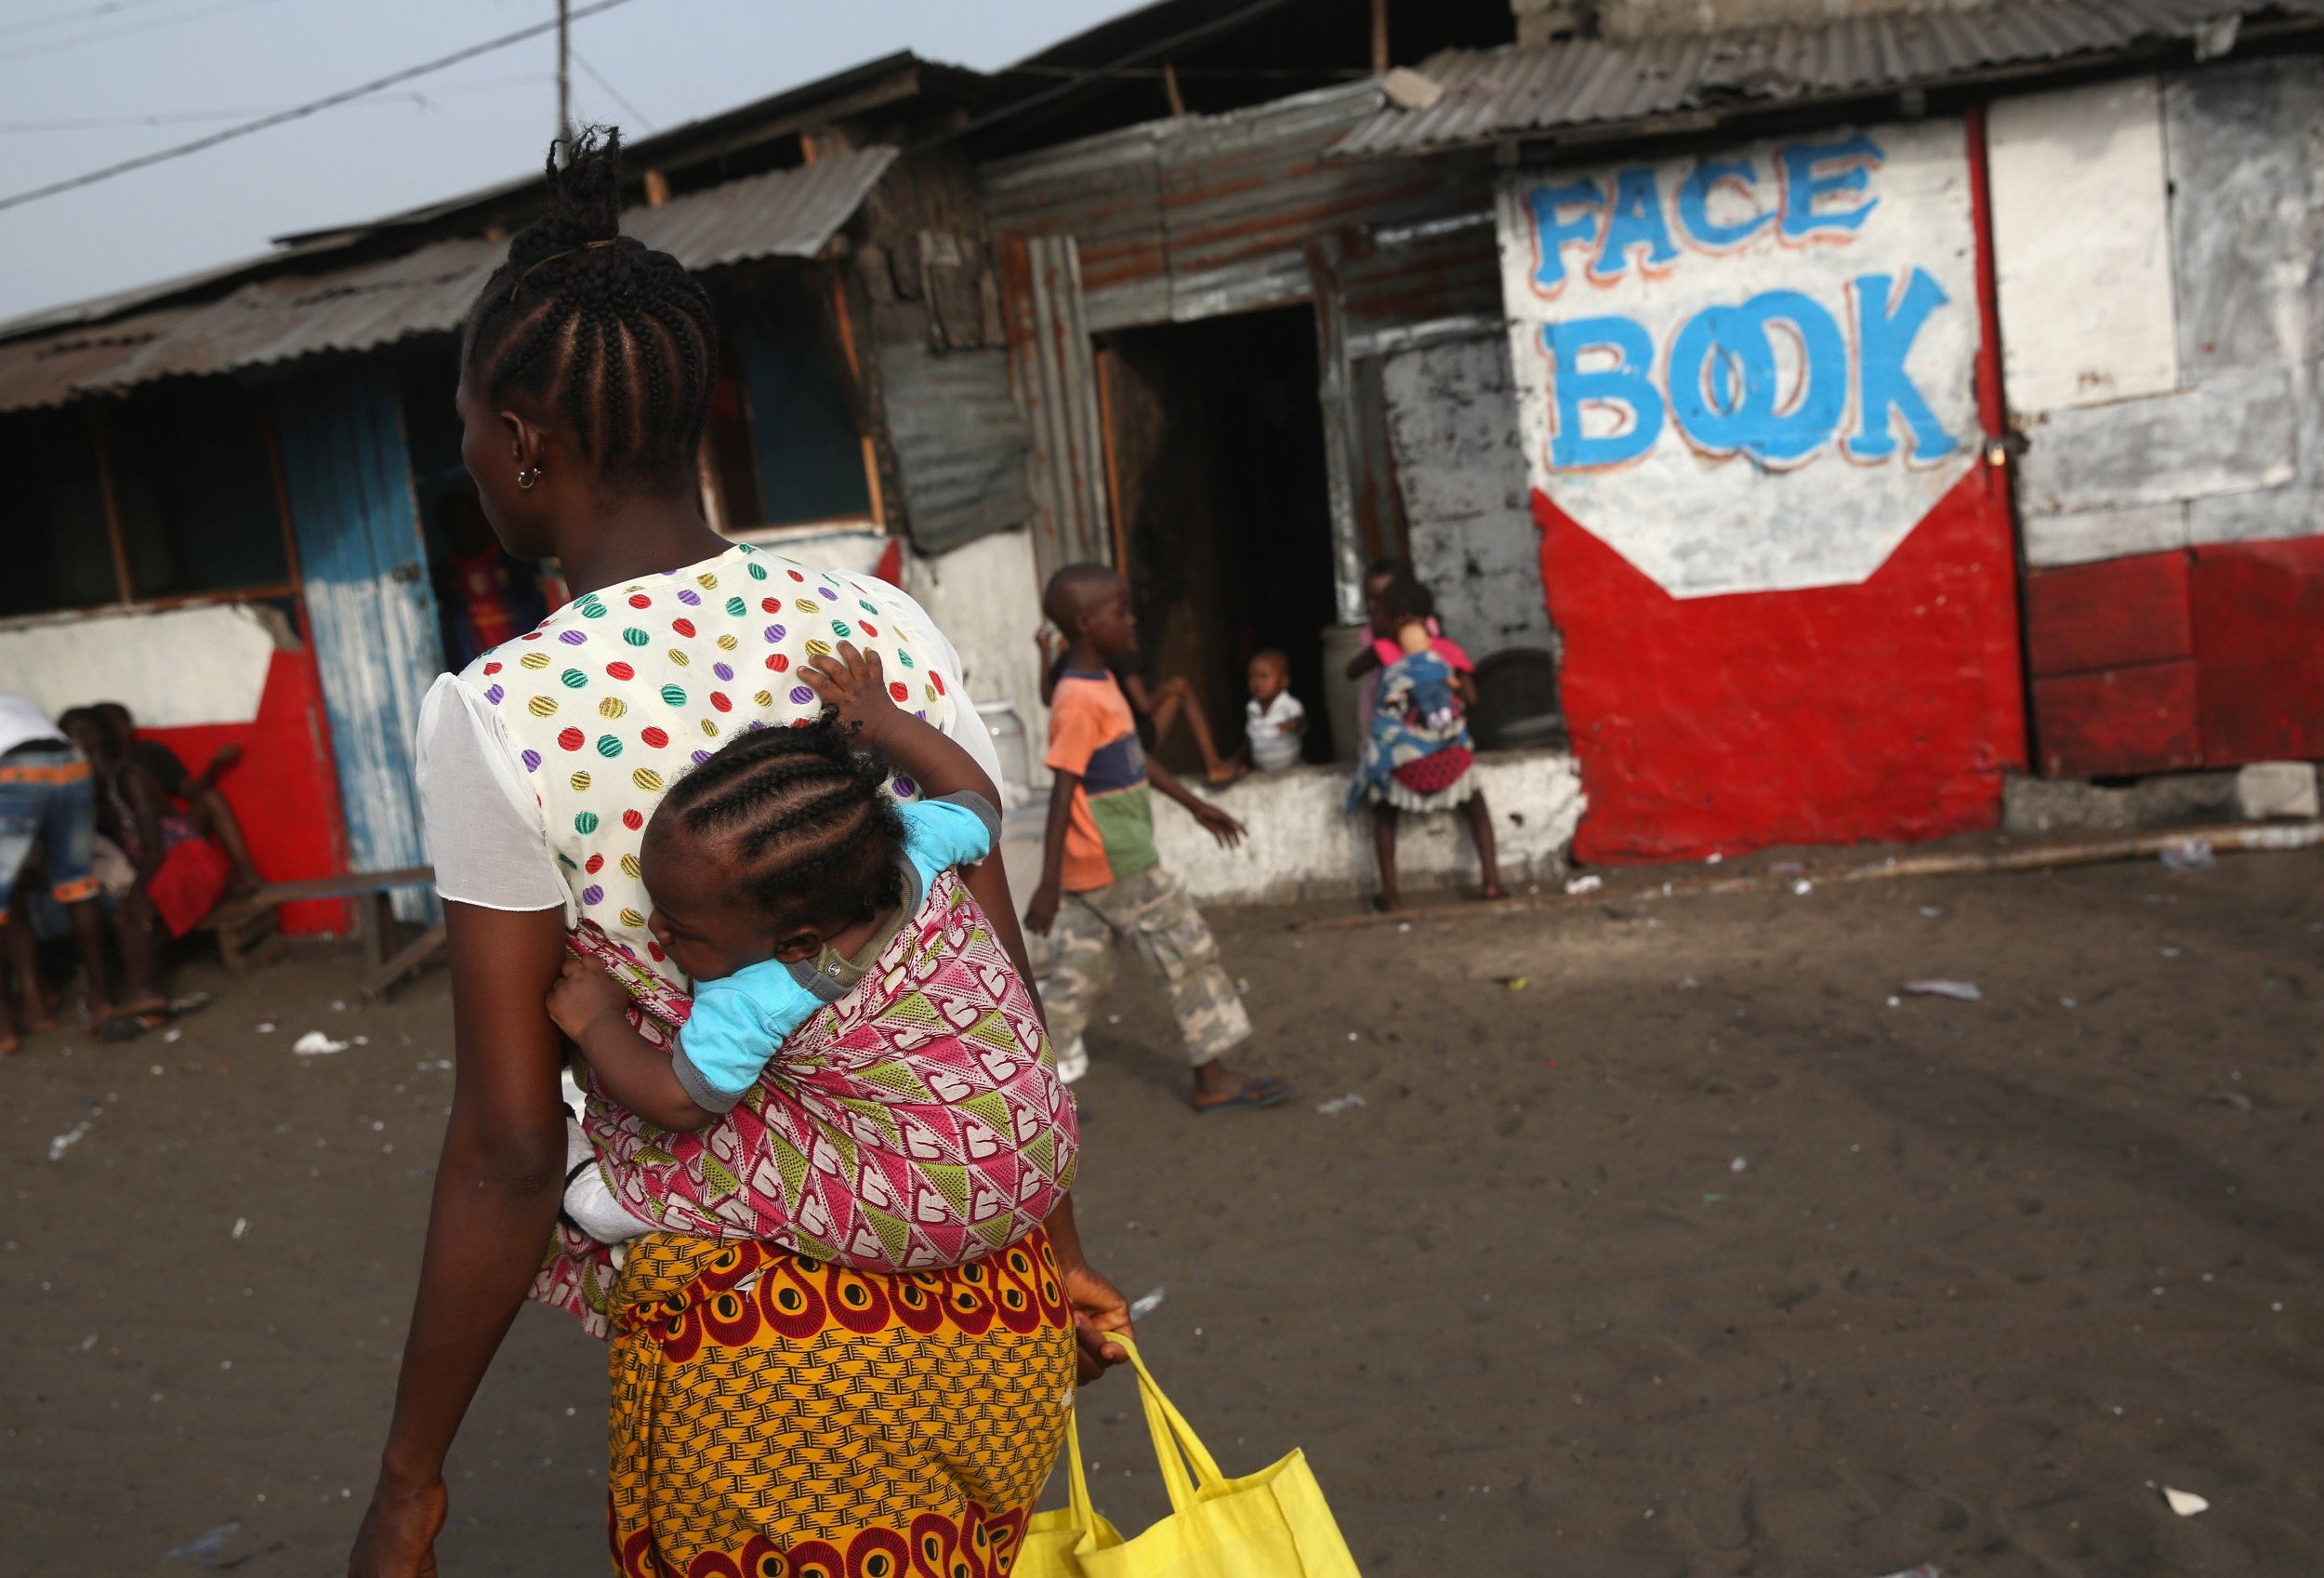 Liberia Internet cafe